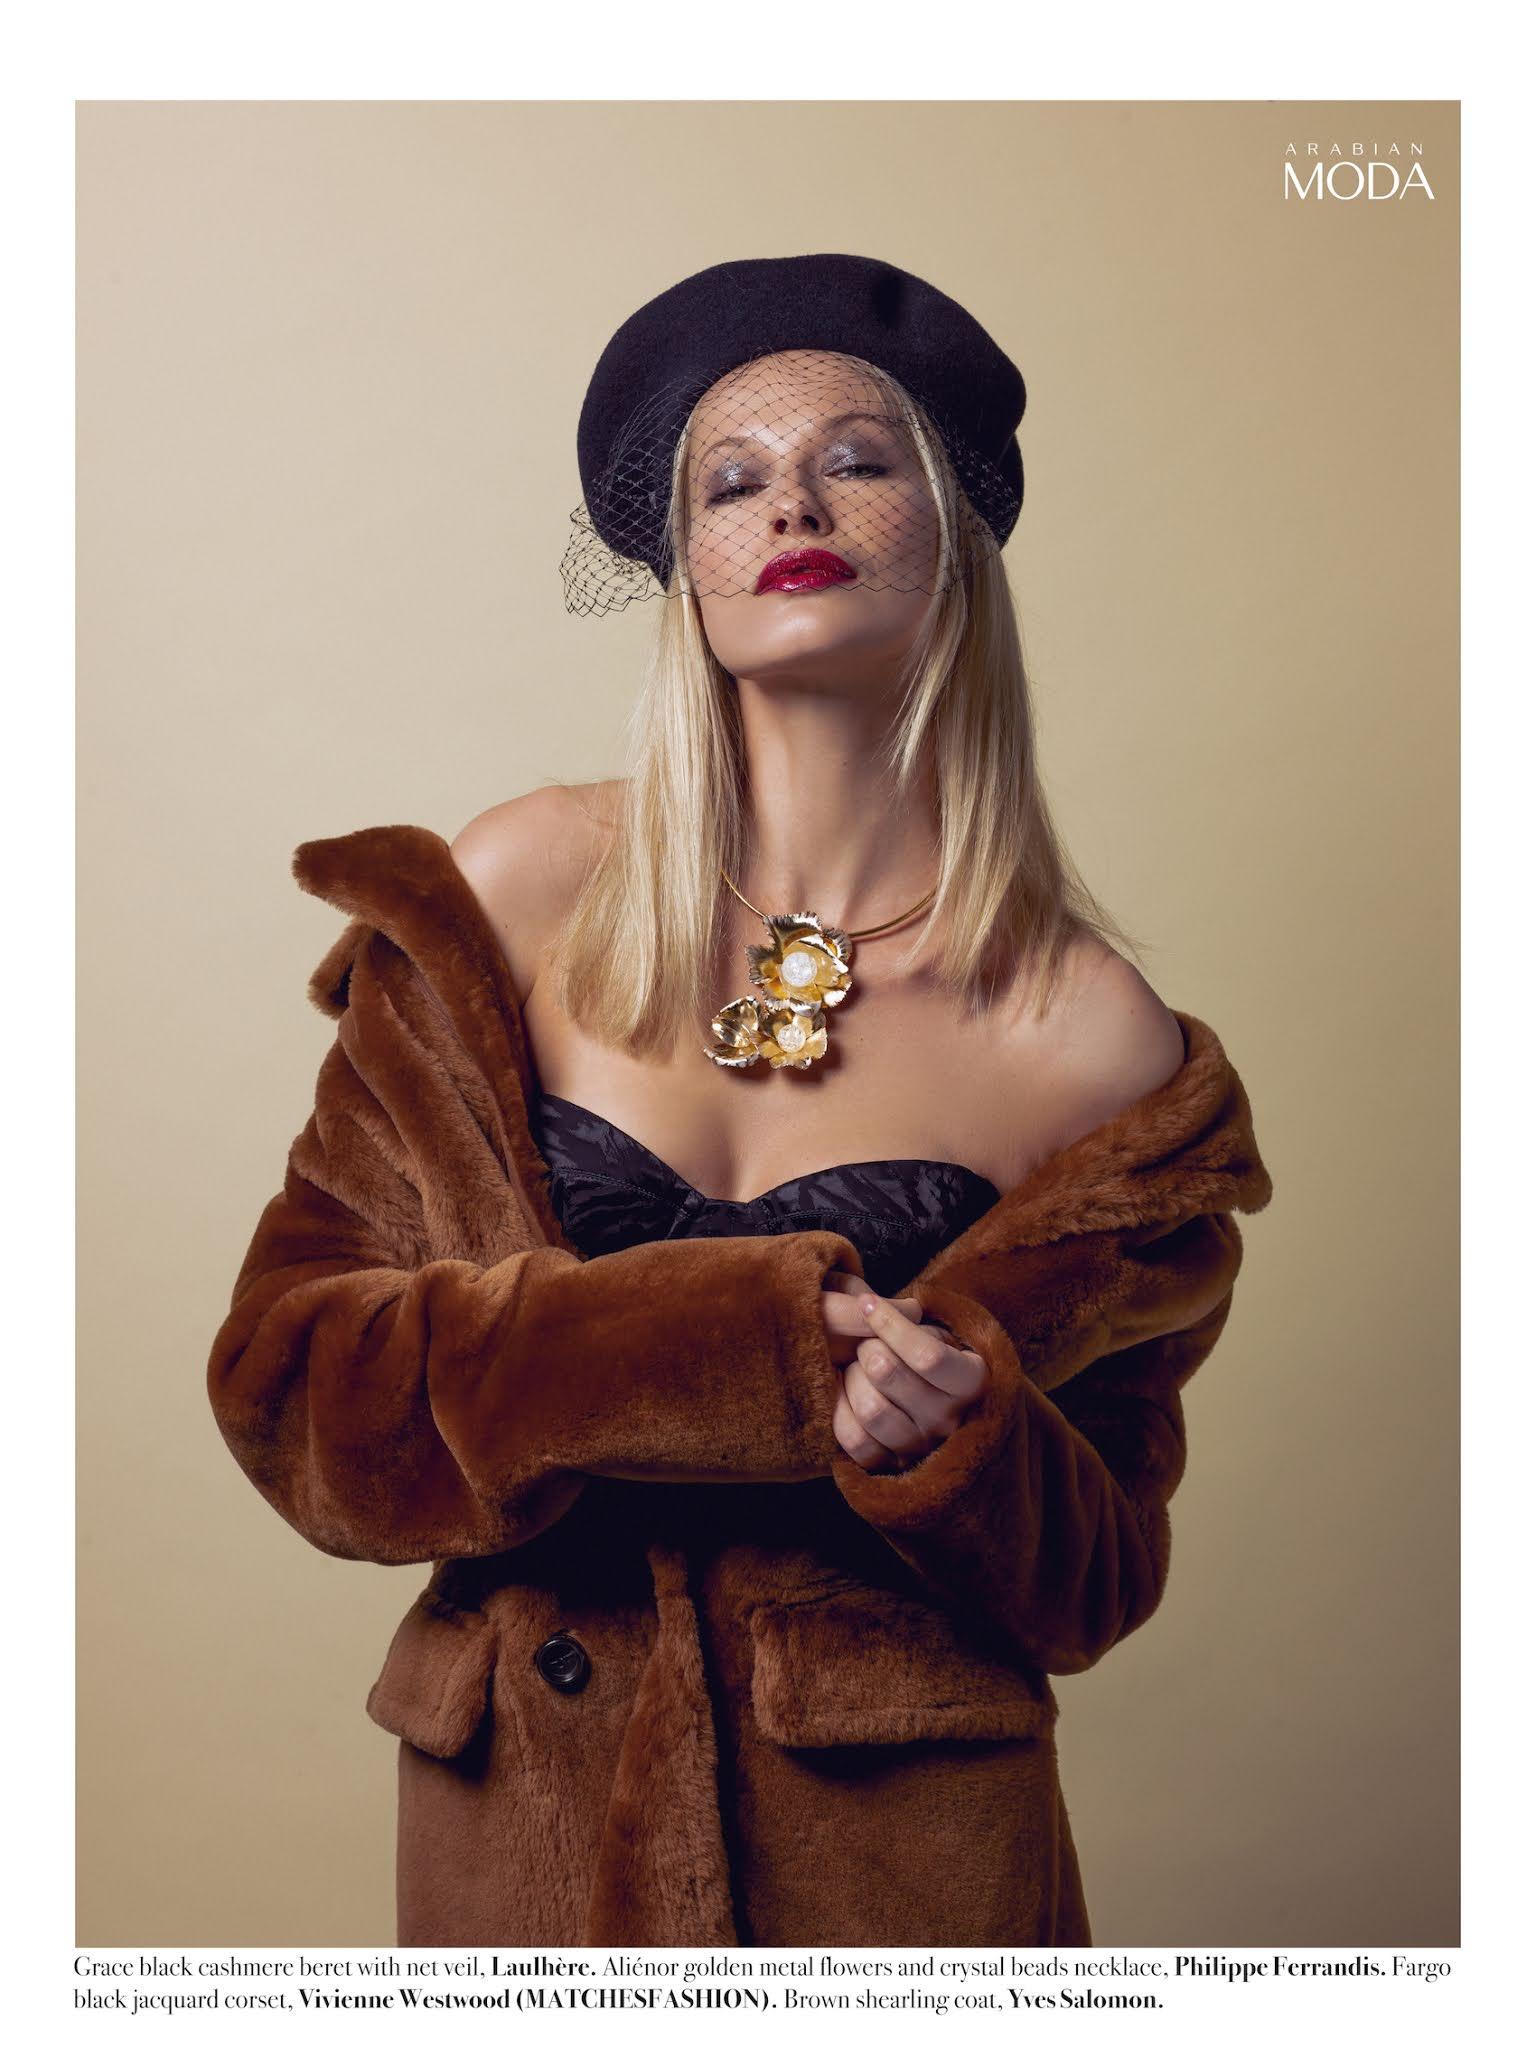 4-Arabian Moda x Laulhère x Philippe Ferrandis x Vivienne Westwood x Yves Salomon